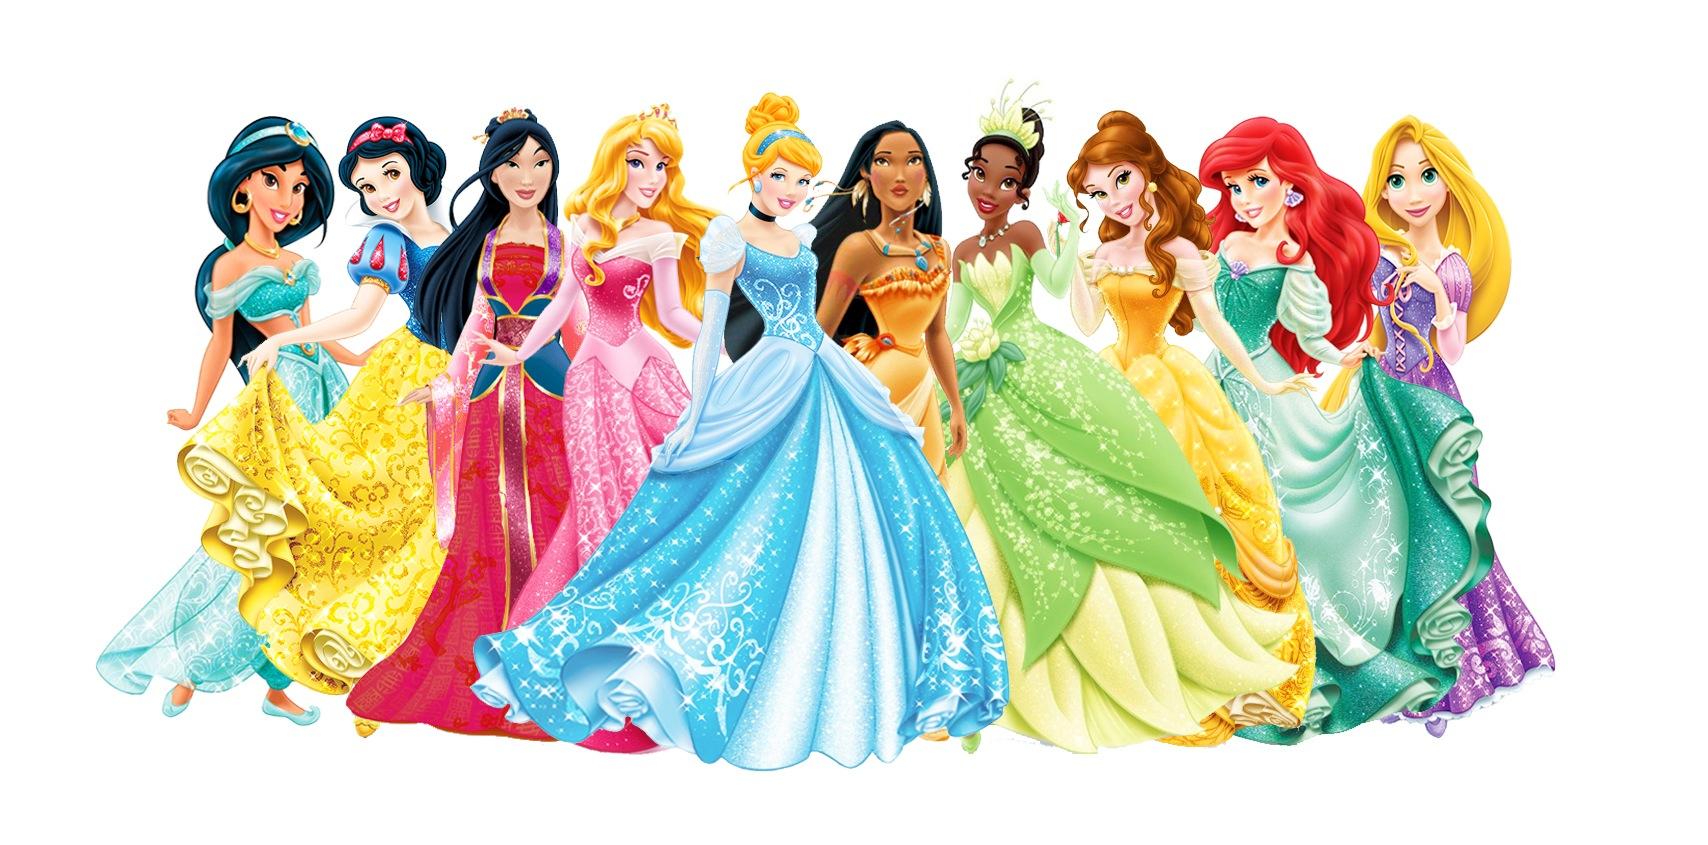 Disneys princess problem why princess of north sudan disneys princess problem why princess of north sudan highlights need for disneys princess rehaul just add color buycottarizona